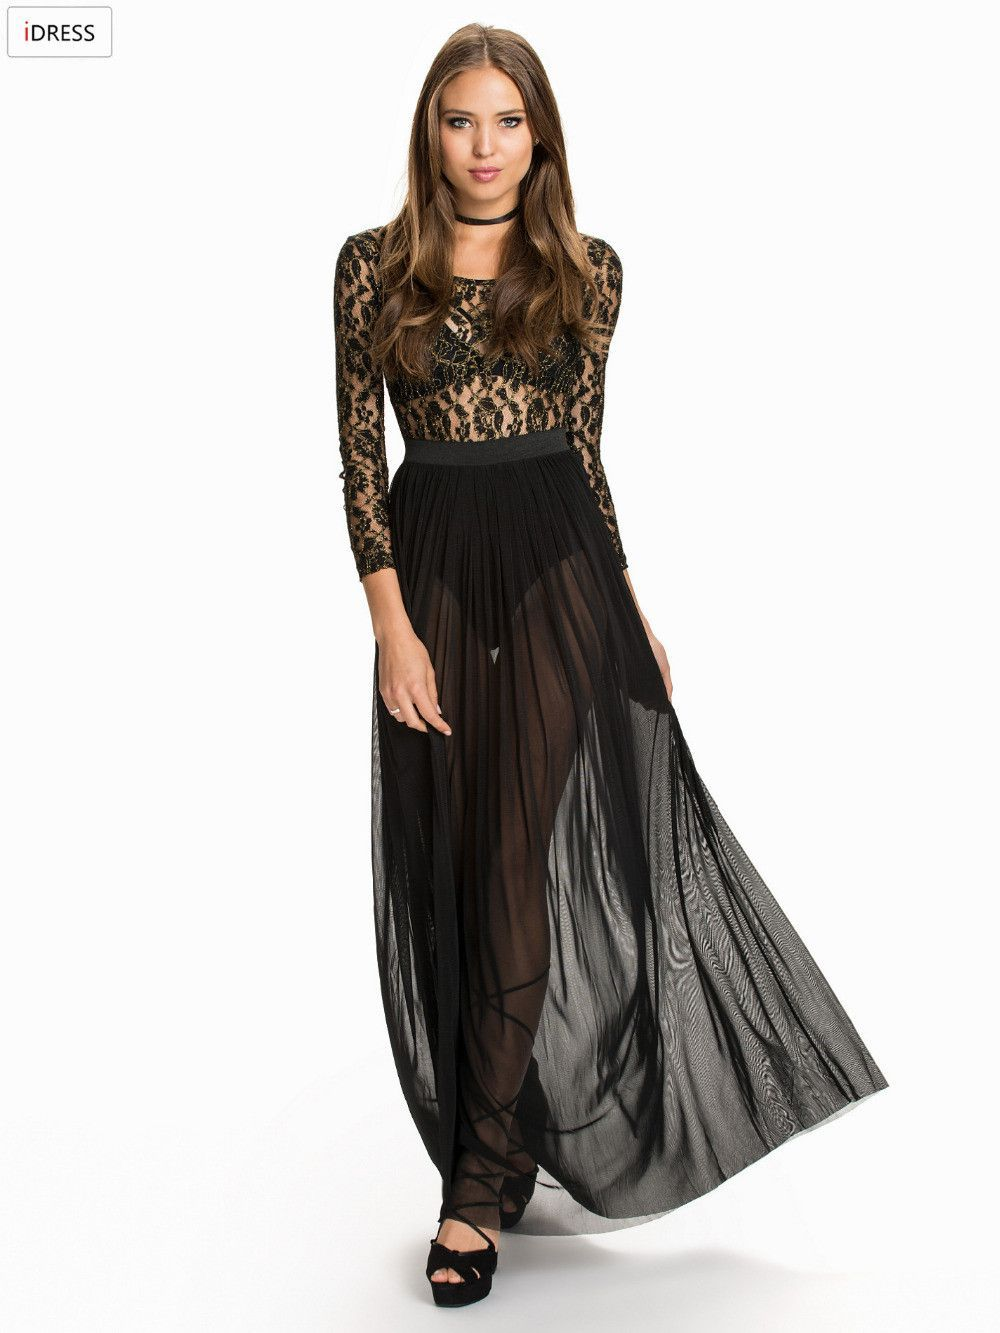 598dc80ae3 IDress Women Black Long Dress Gold Flower Lace Long Sleeve Party ...